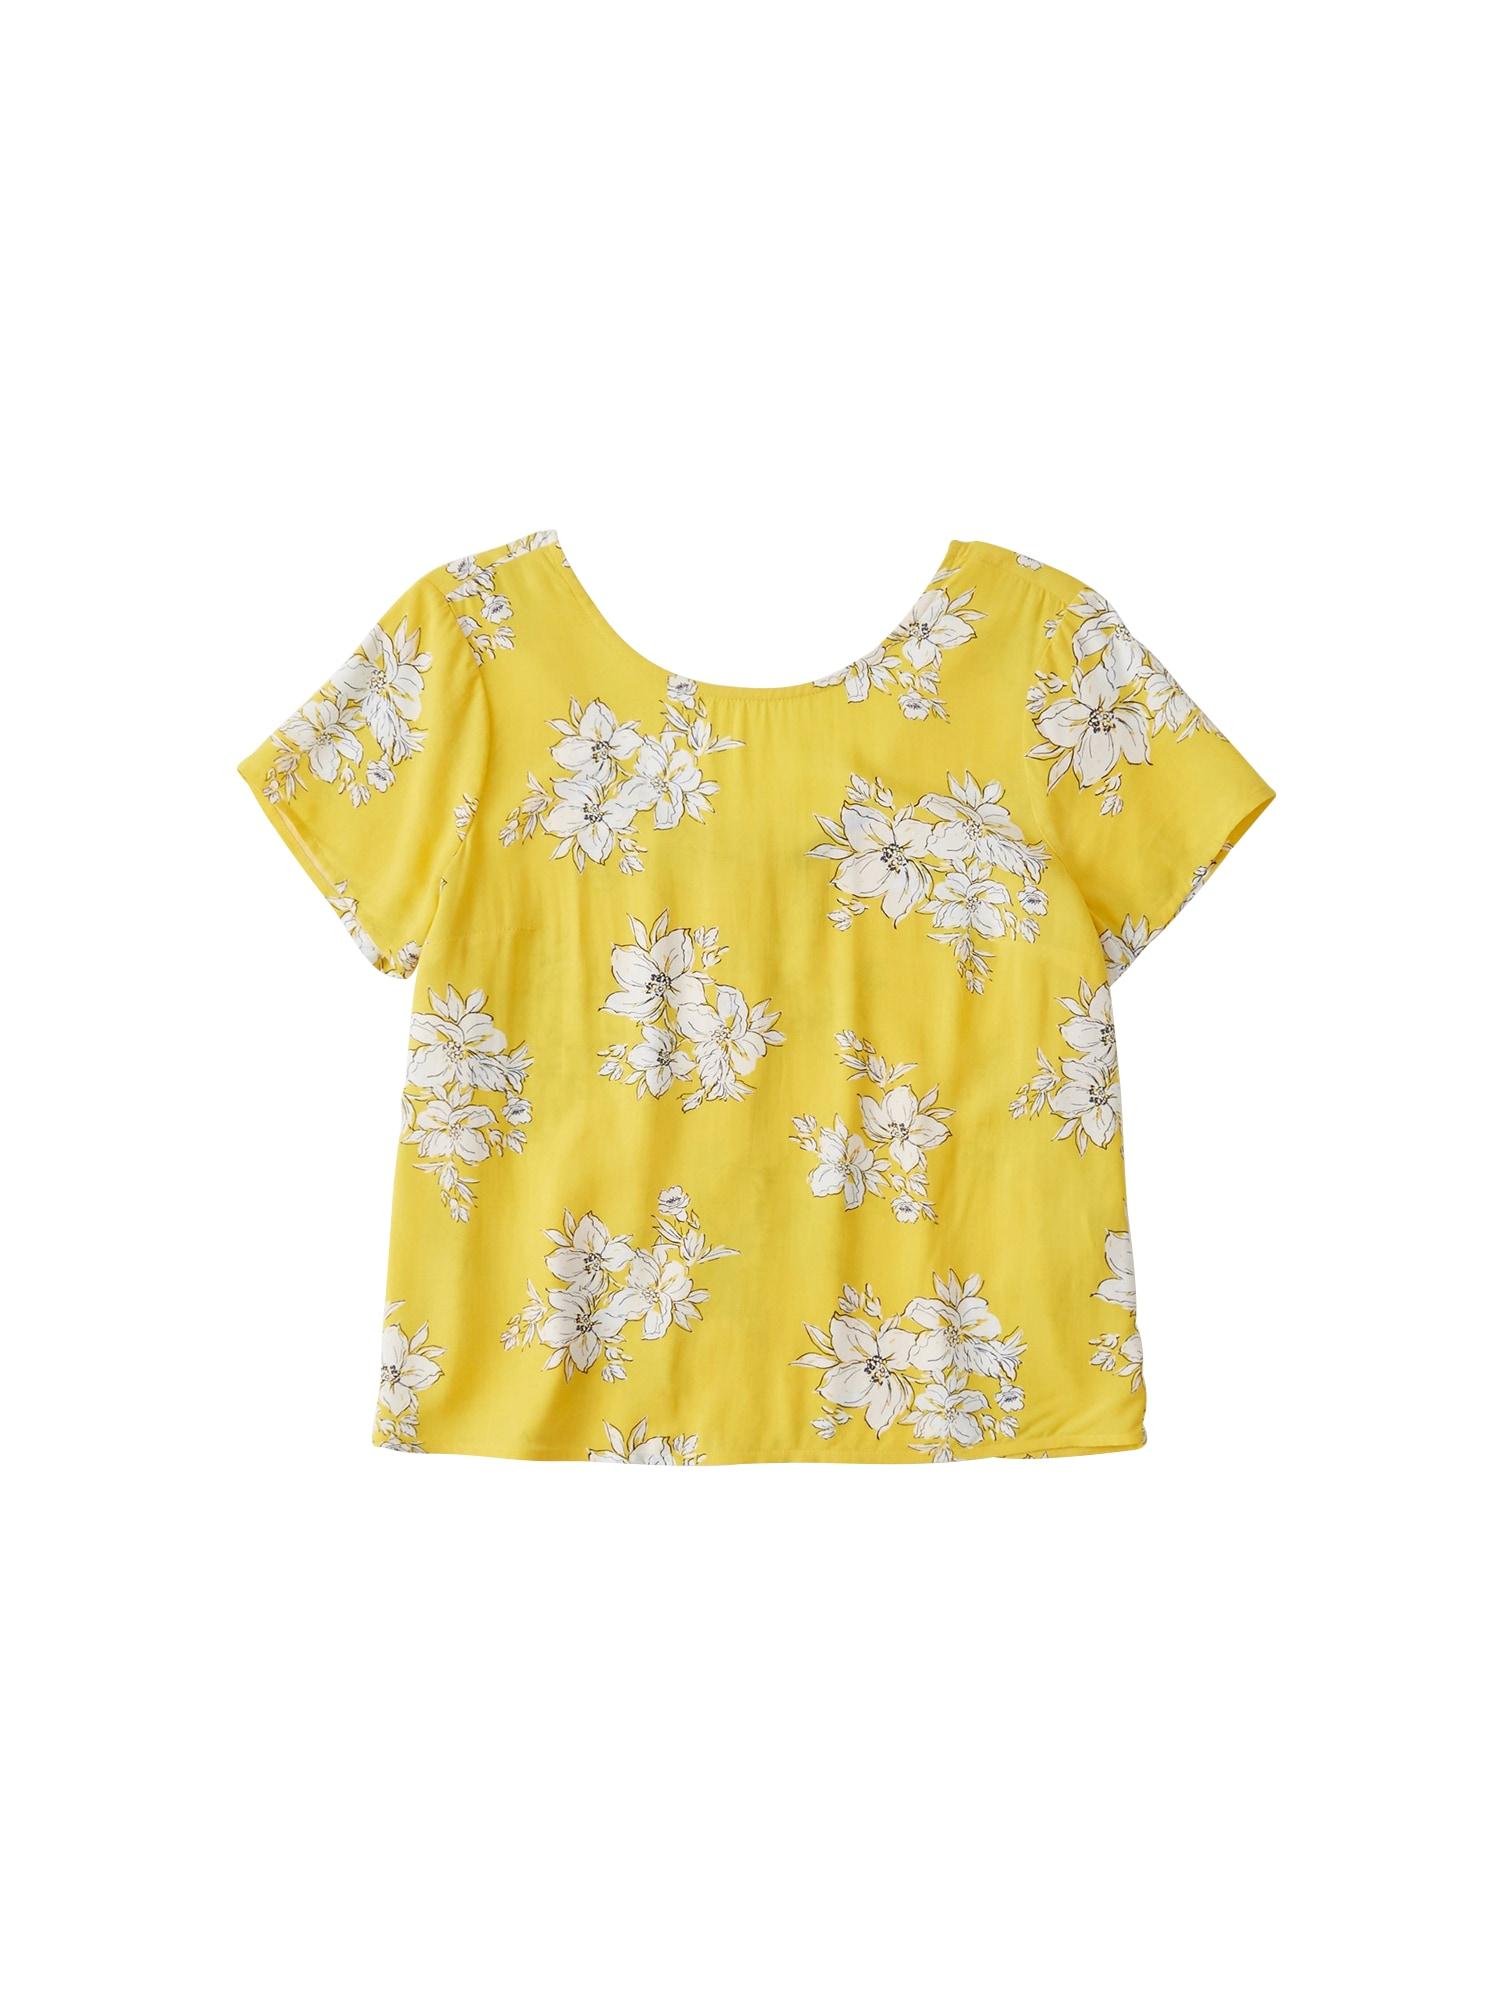 Abercrombie & Fitch Marškinėliai geltona